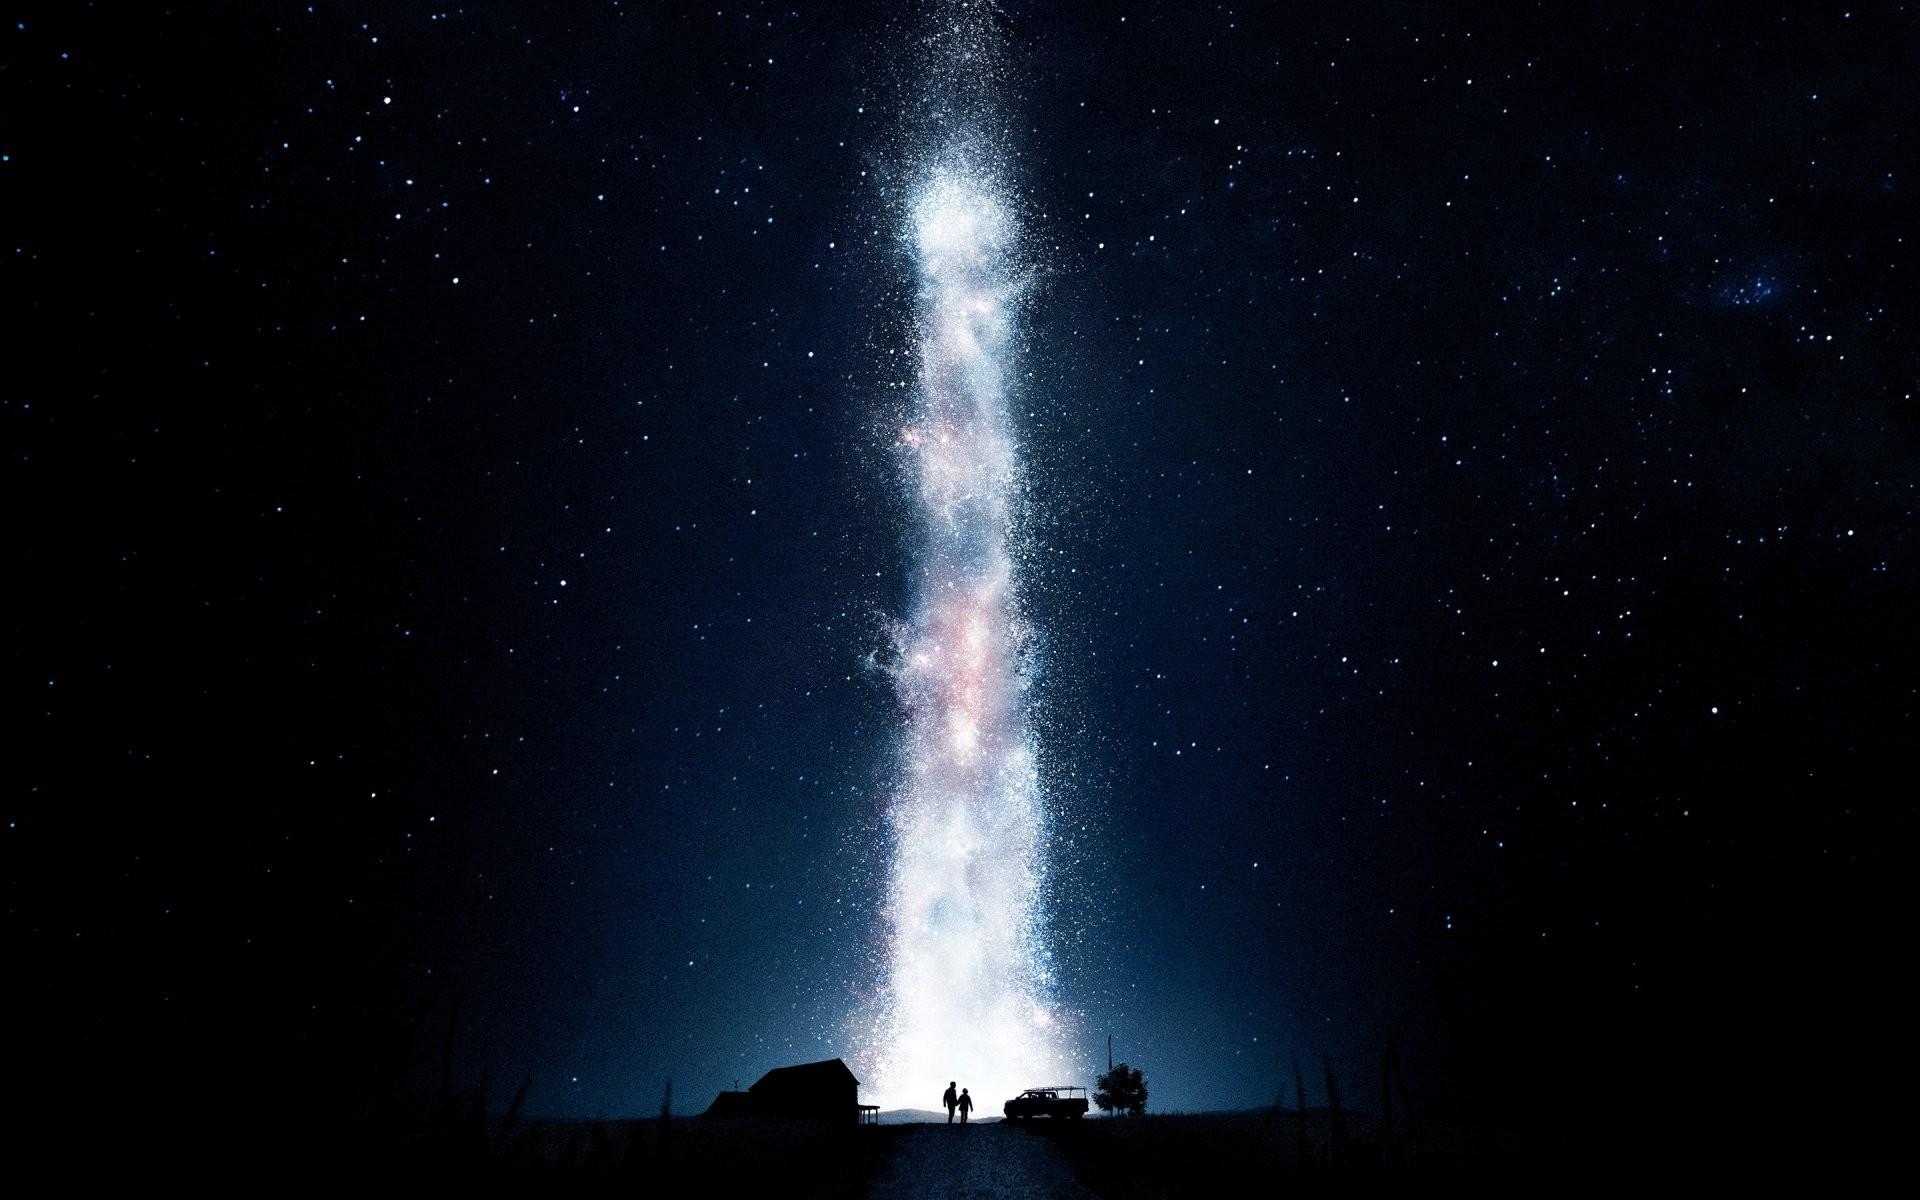 Interstellar Wallpaper Hd 78 Images